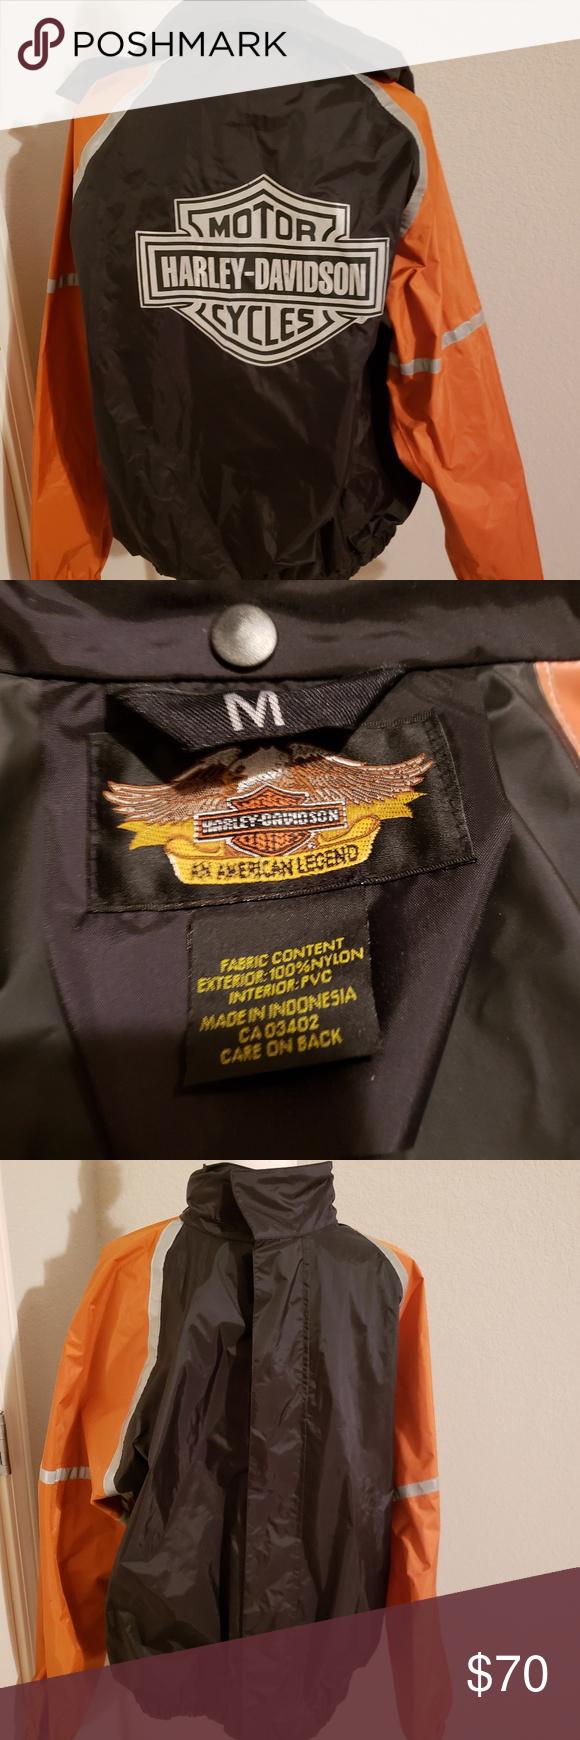 Harley Davidson Rain Jacket Medium 25 Across Chest 28 Long Like New Mens Medium Ladies Xl Harley Davidson Jackets Coats Raincoats Harley Davidson Jackets Rain Jacket